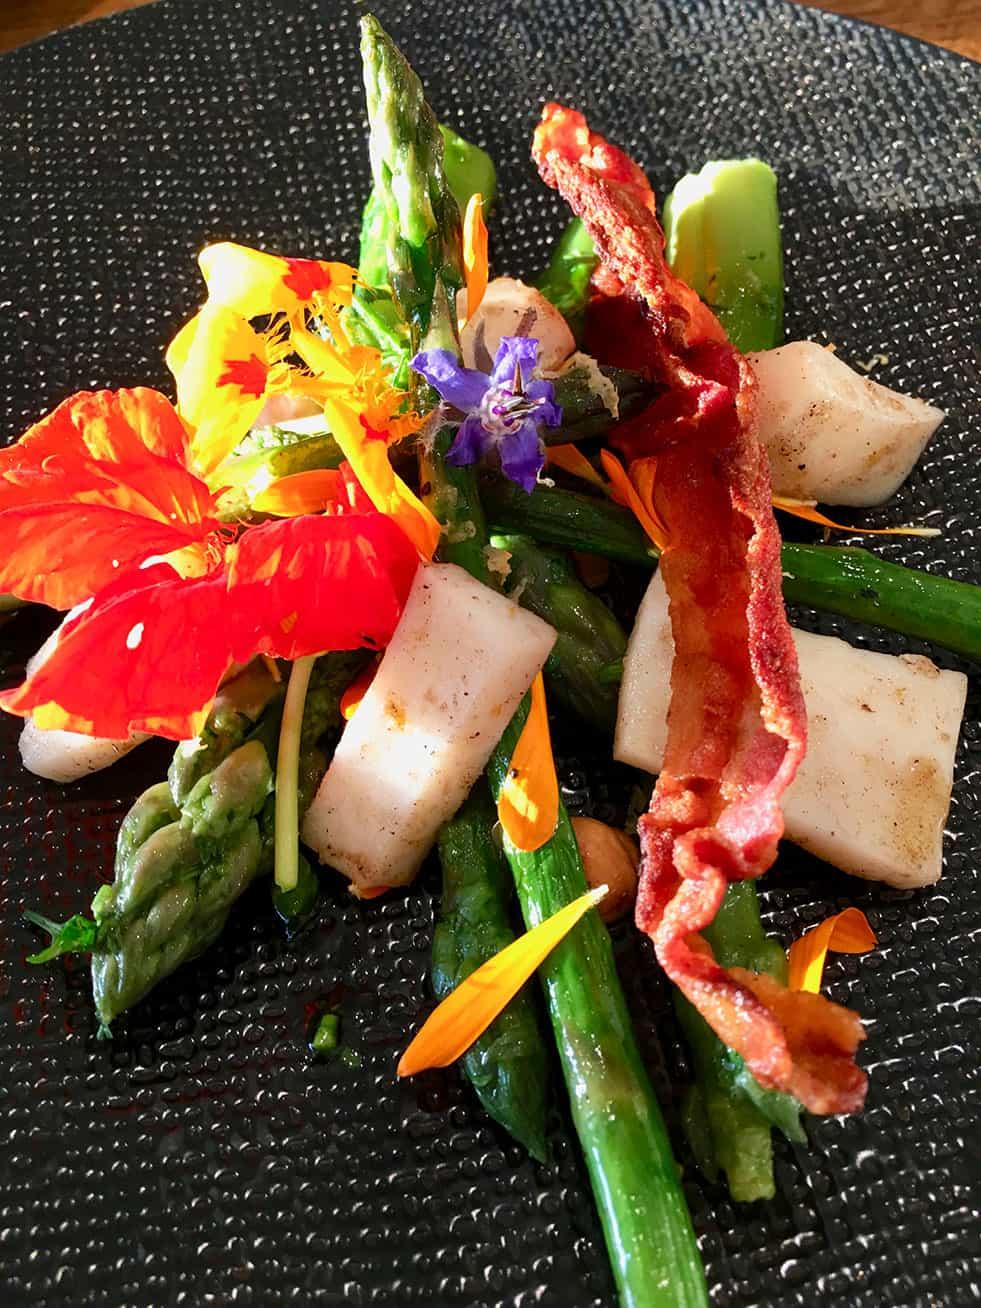 Cuisine gastronomique au Metafort en Luberon